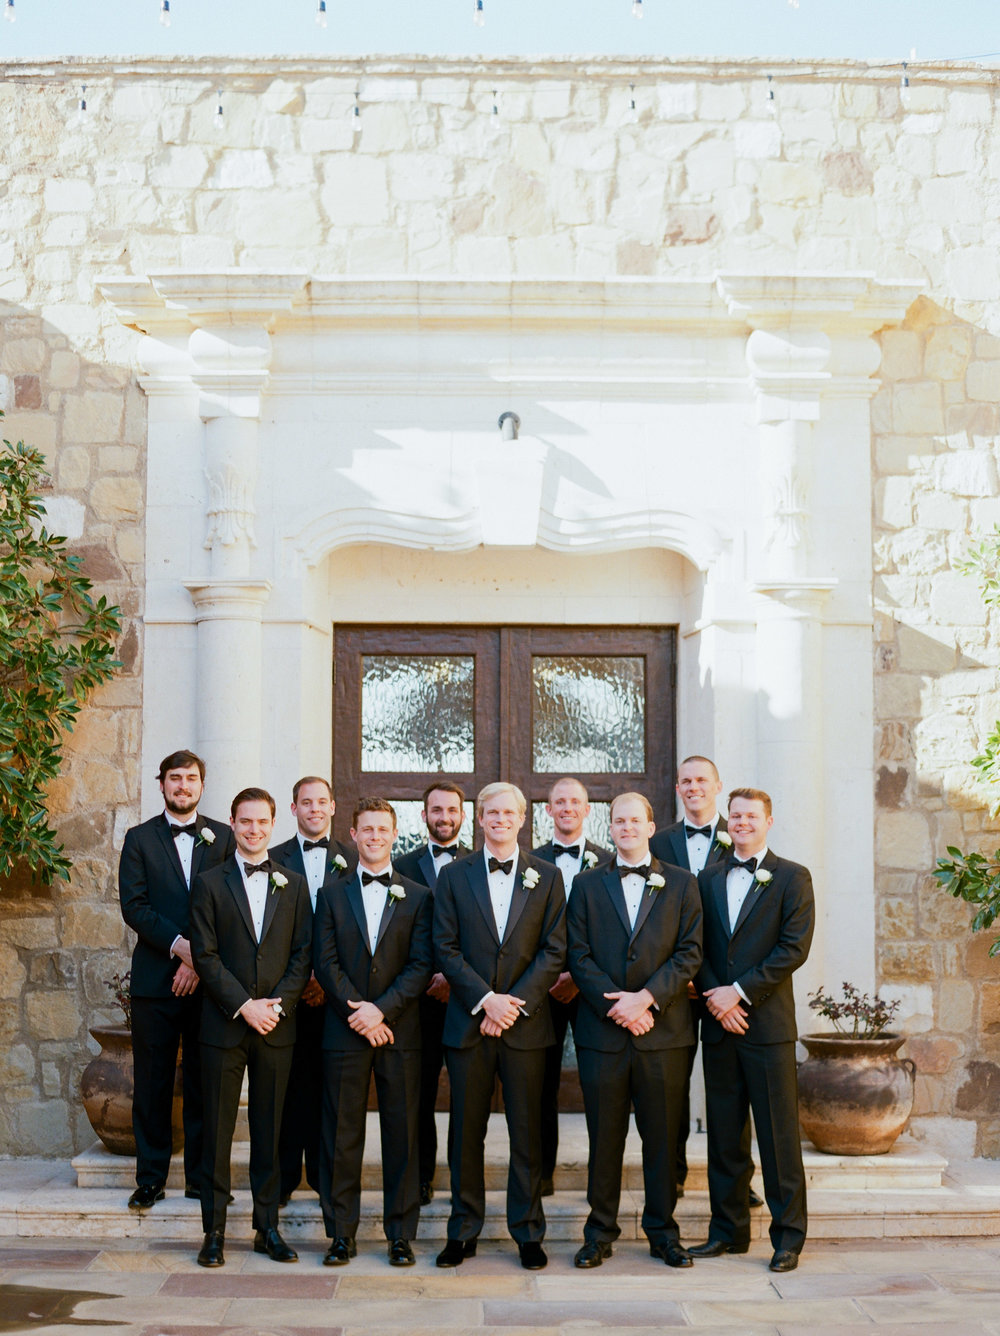 Escondido-Golf_Lake-Club-Hill-Country-Houston-Wedding-Photographer-Best-Top-Luxury-Destination-Engagements-Portrait-Austin-Photography-27.jpg